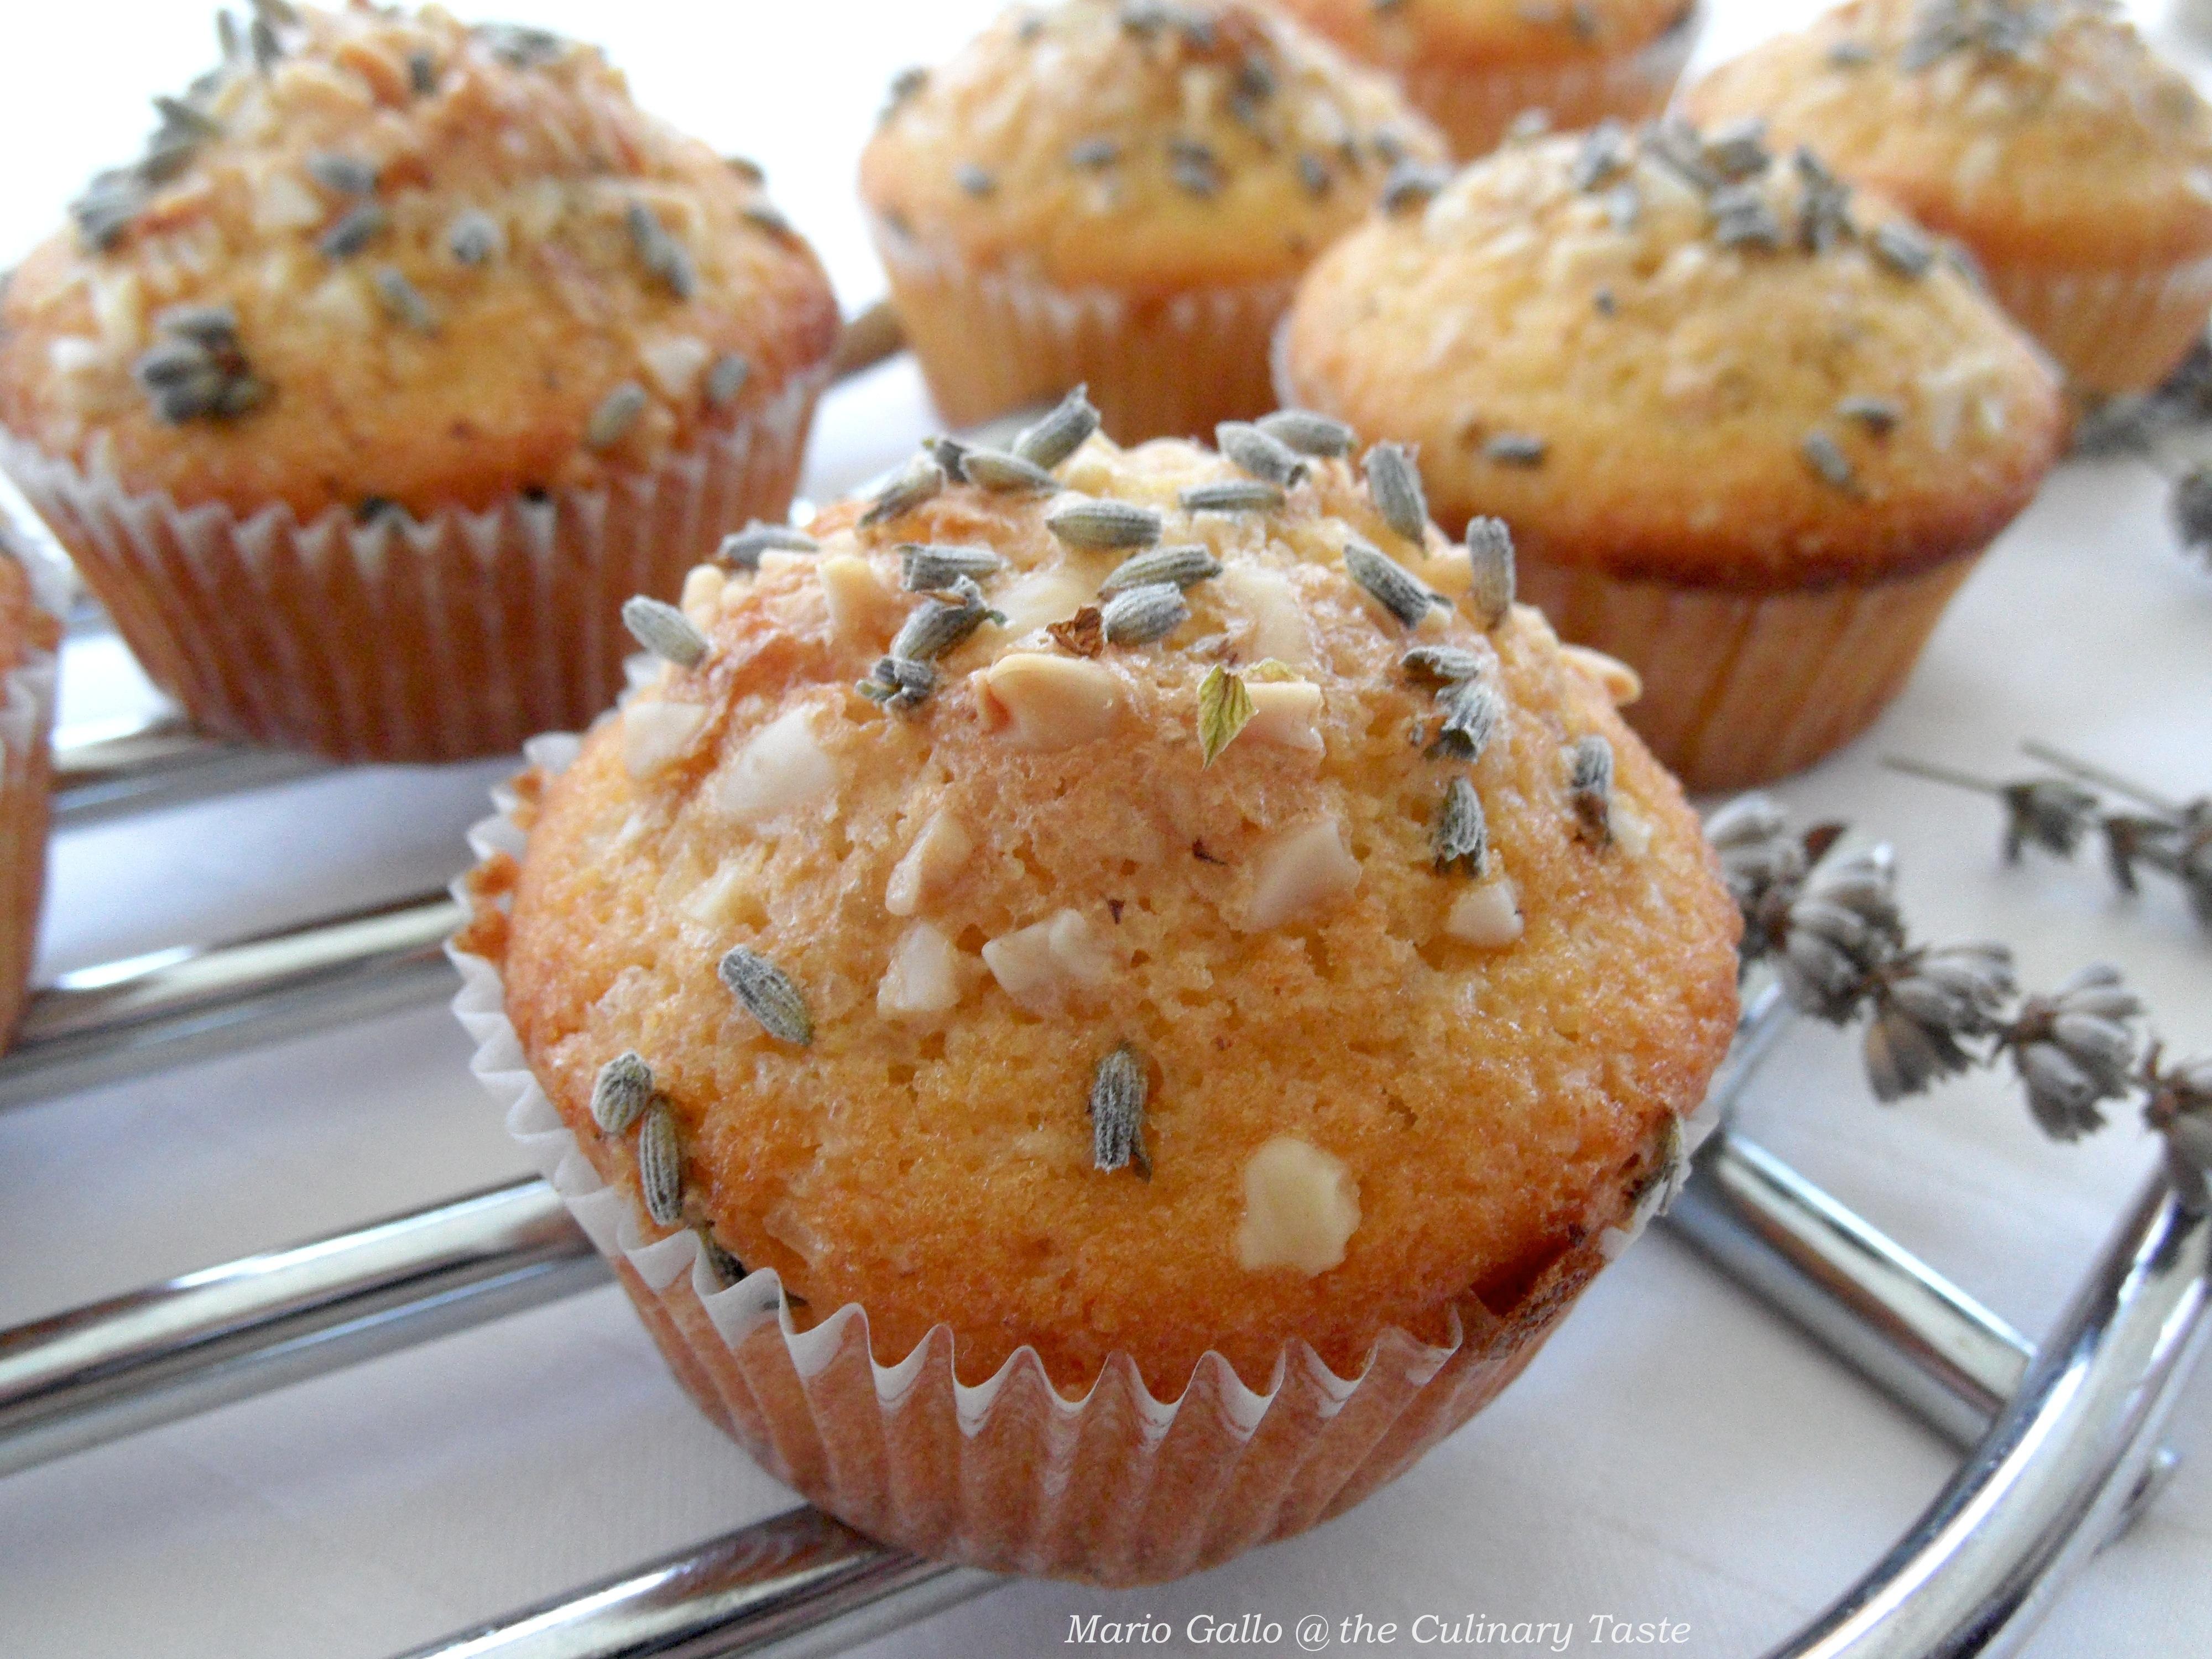 Almond Cupcake Recipe With Cake Mix